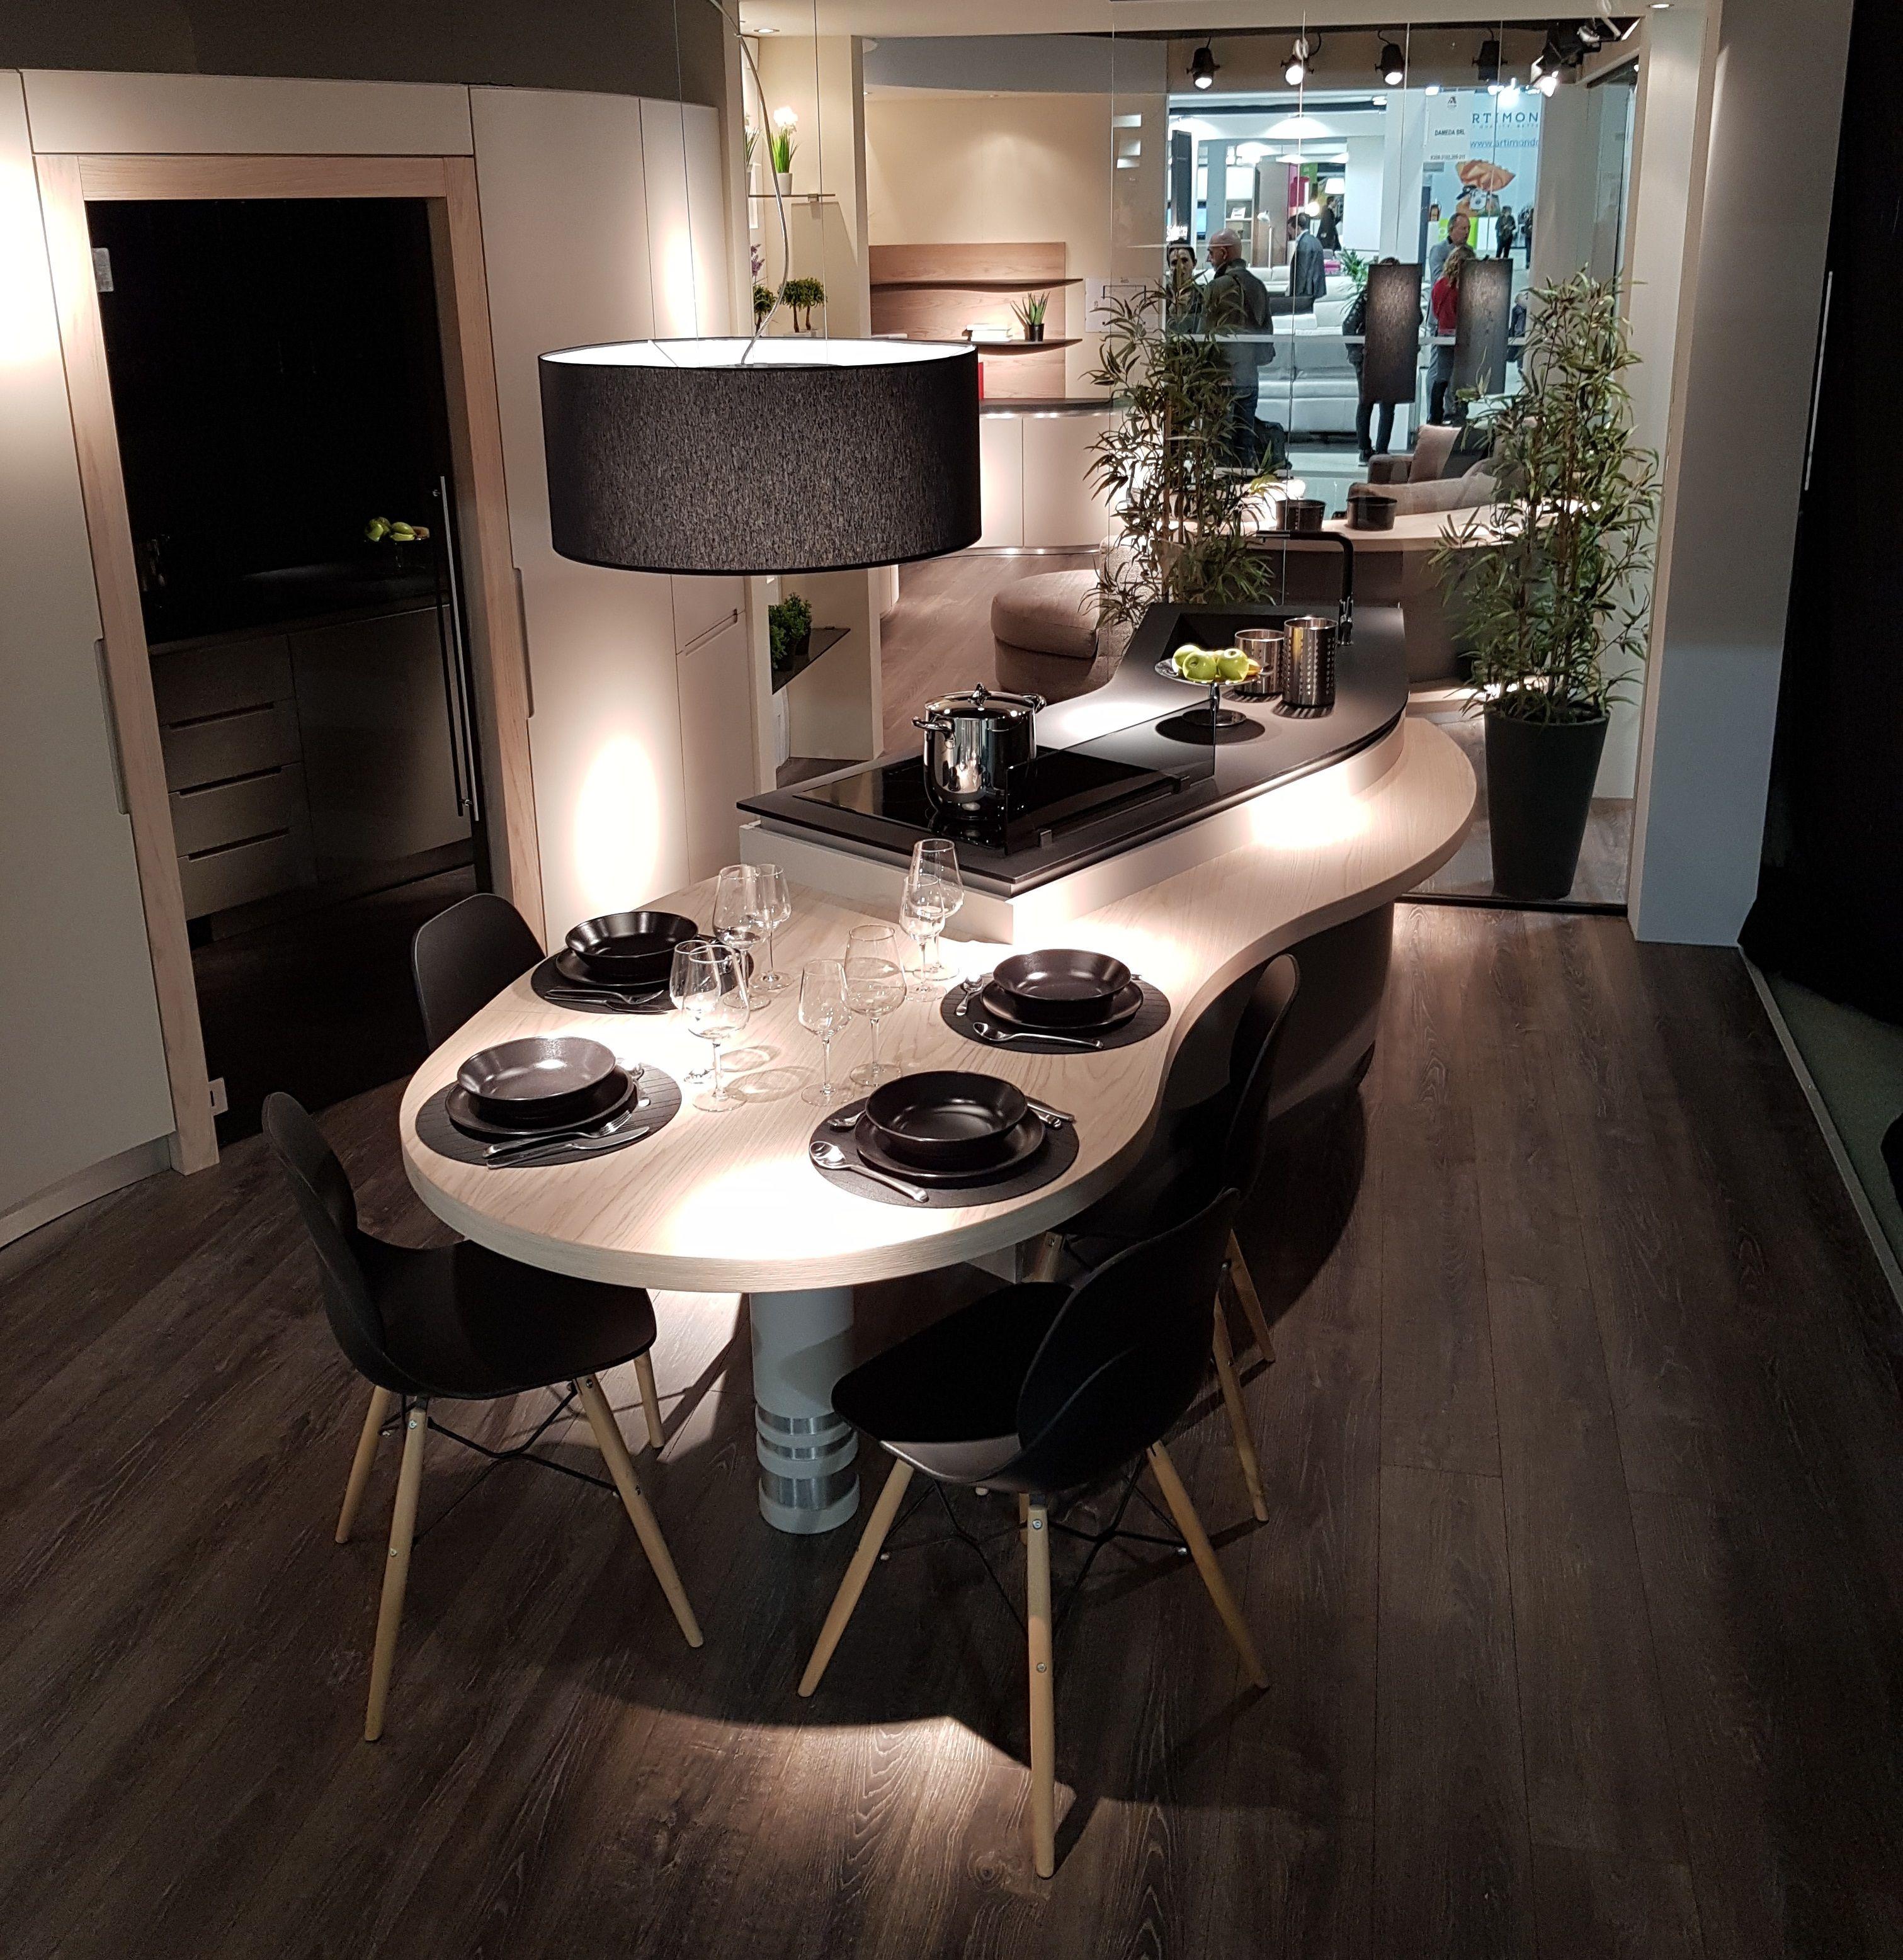 Cucine Moderne Con Isola Curva.Cucina Curva Snake Versione 2019 Presentata A L Artigiano